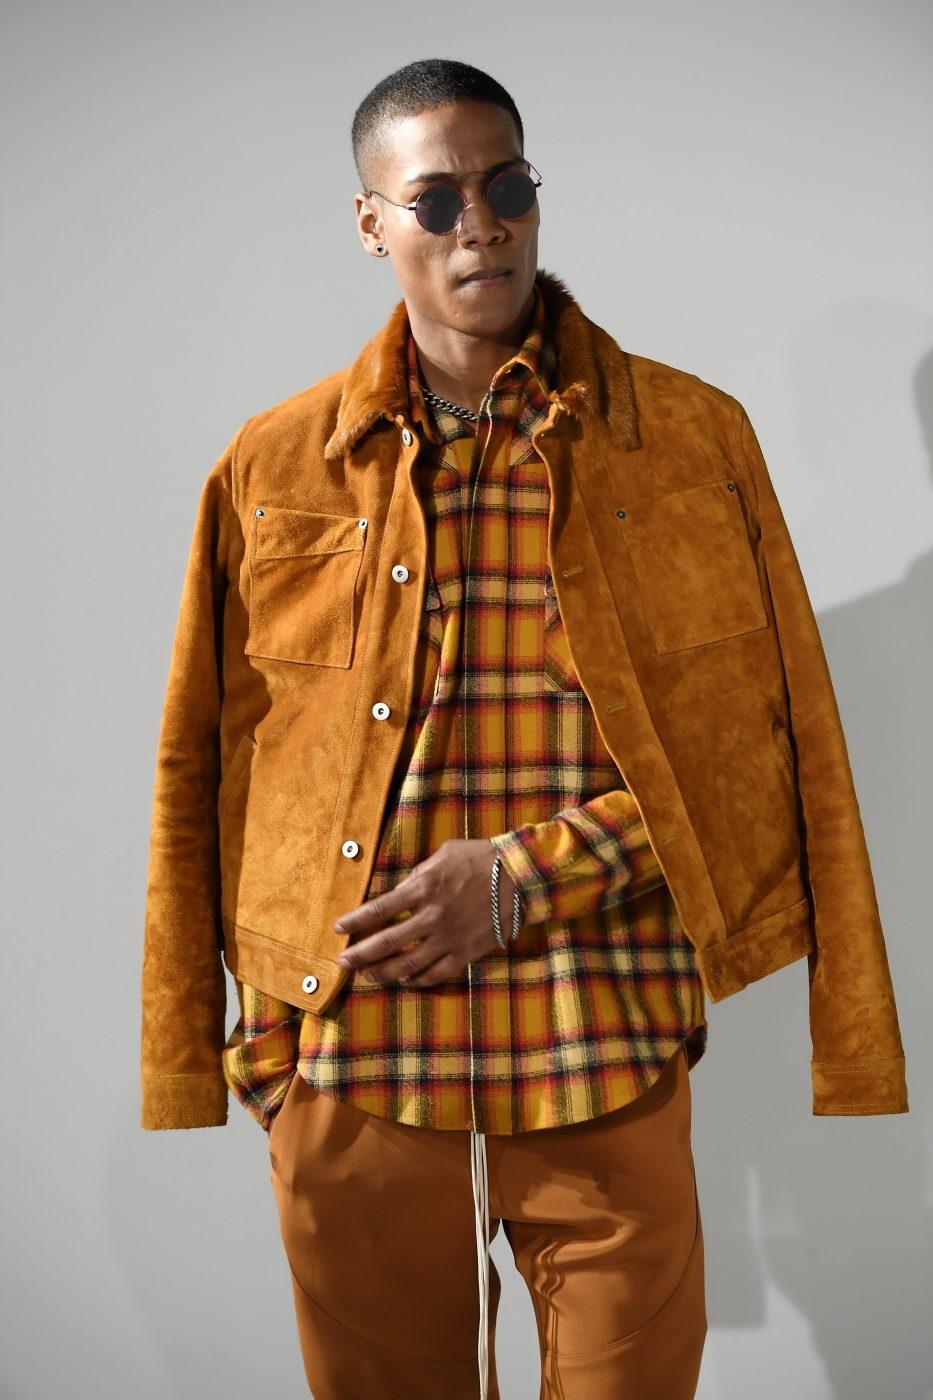 Rideau, New York Menswear, 7/11/2016 • We Are Fur